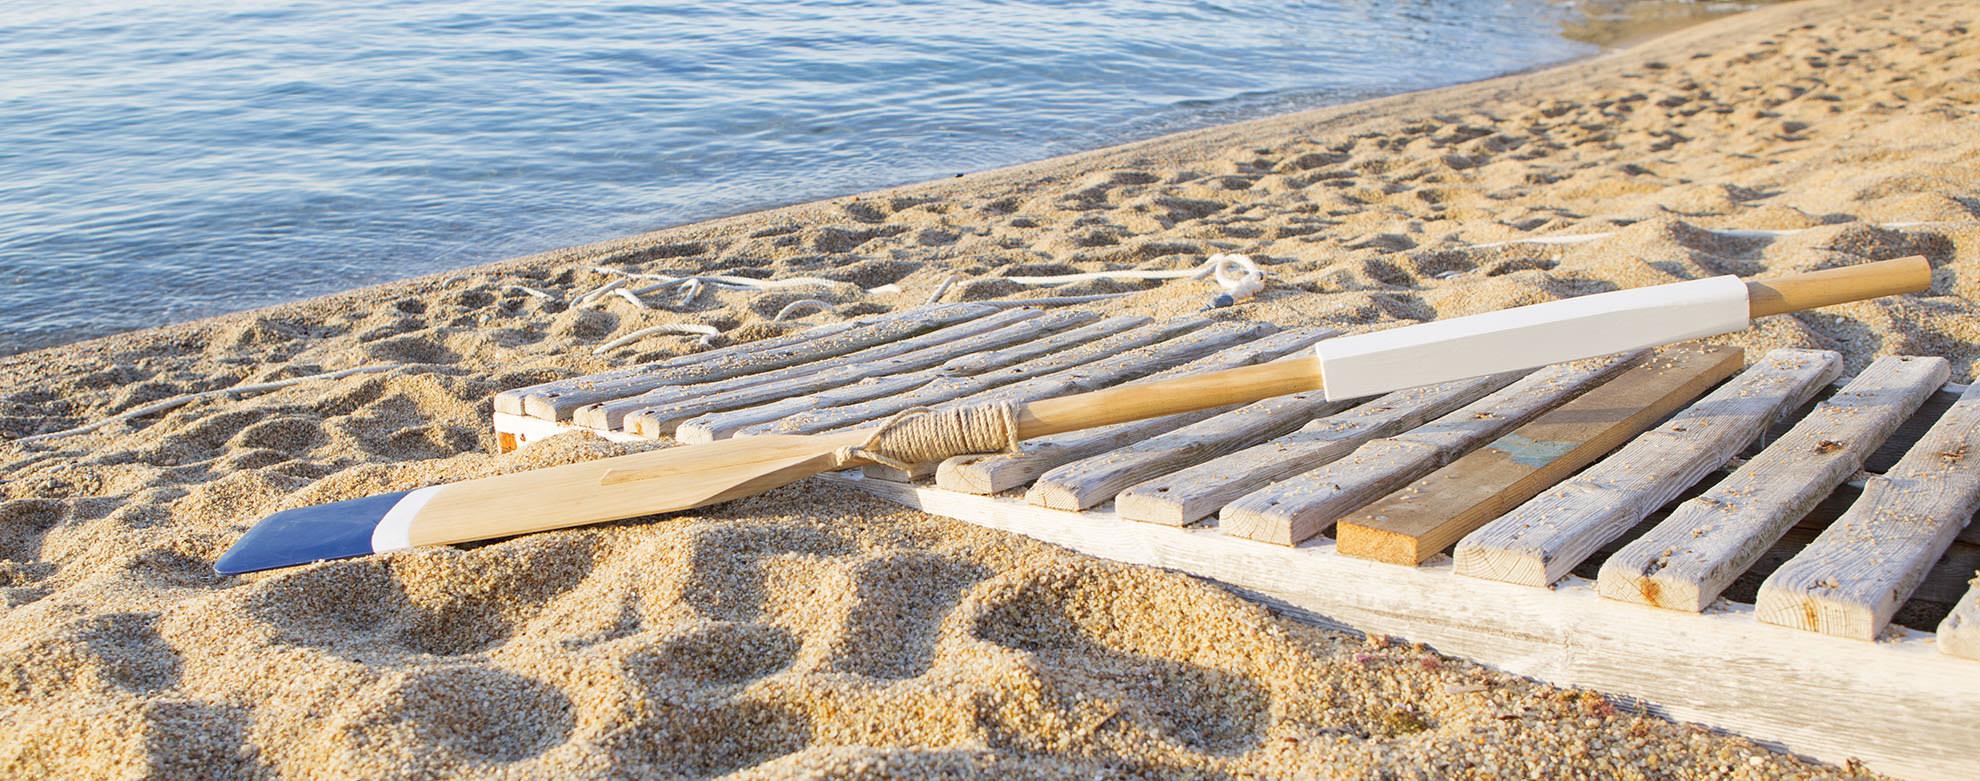 Deko paddel online shop kaufen mare me maritime dekoration geschenke - Holzpaddel deko ...